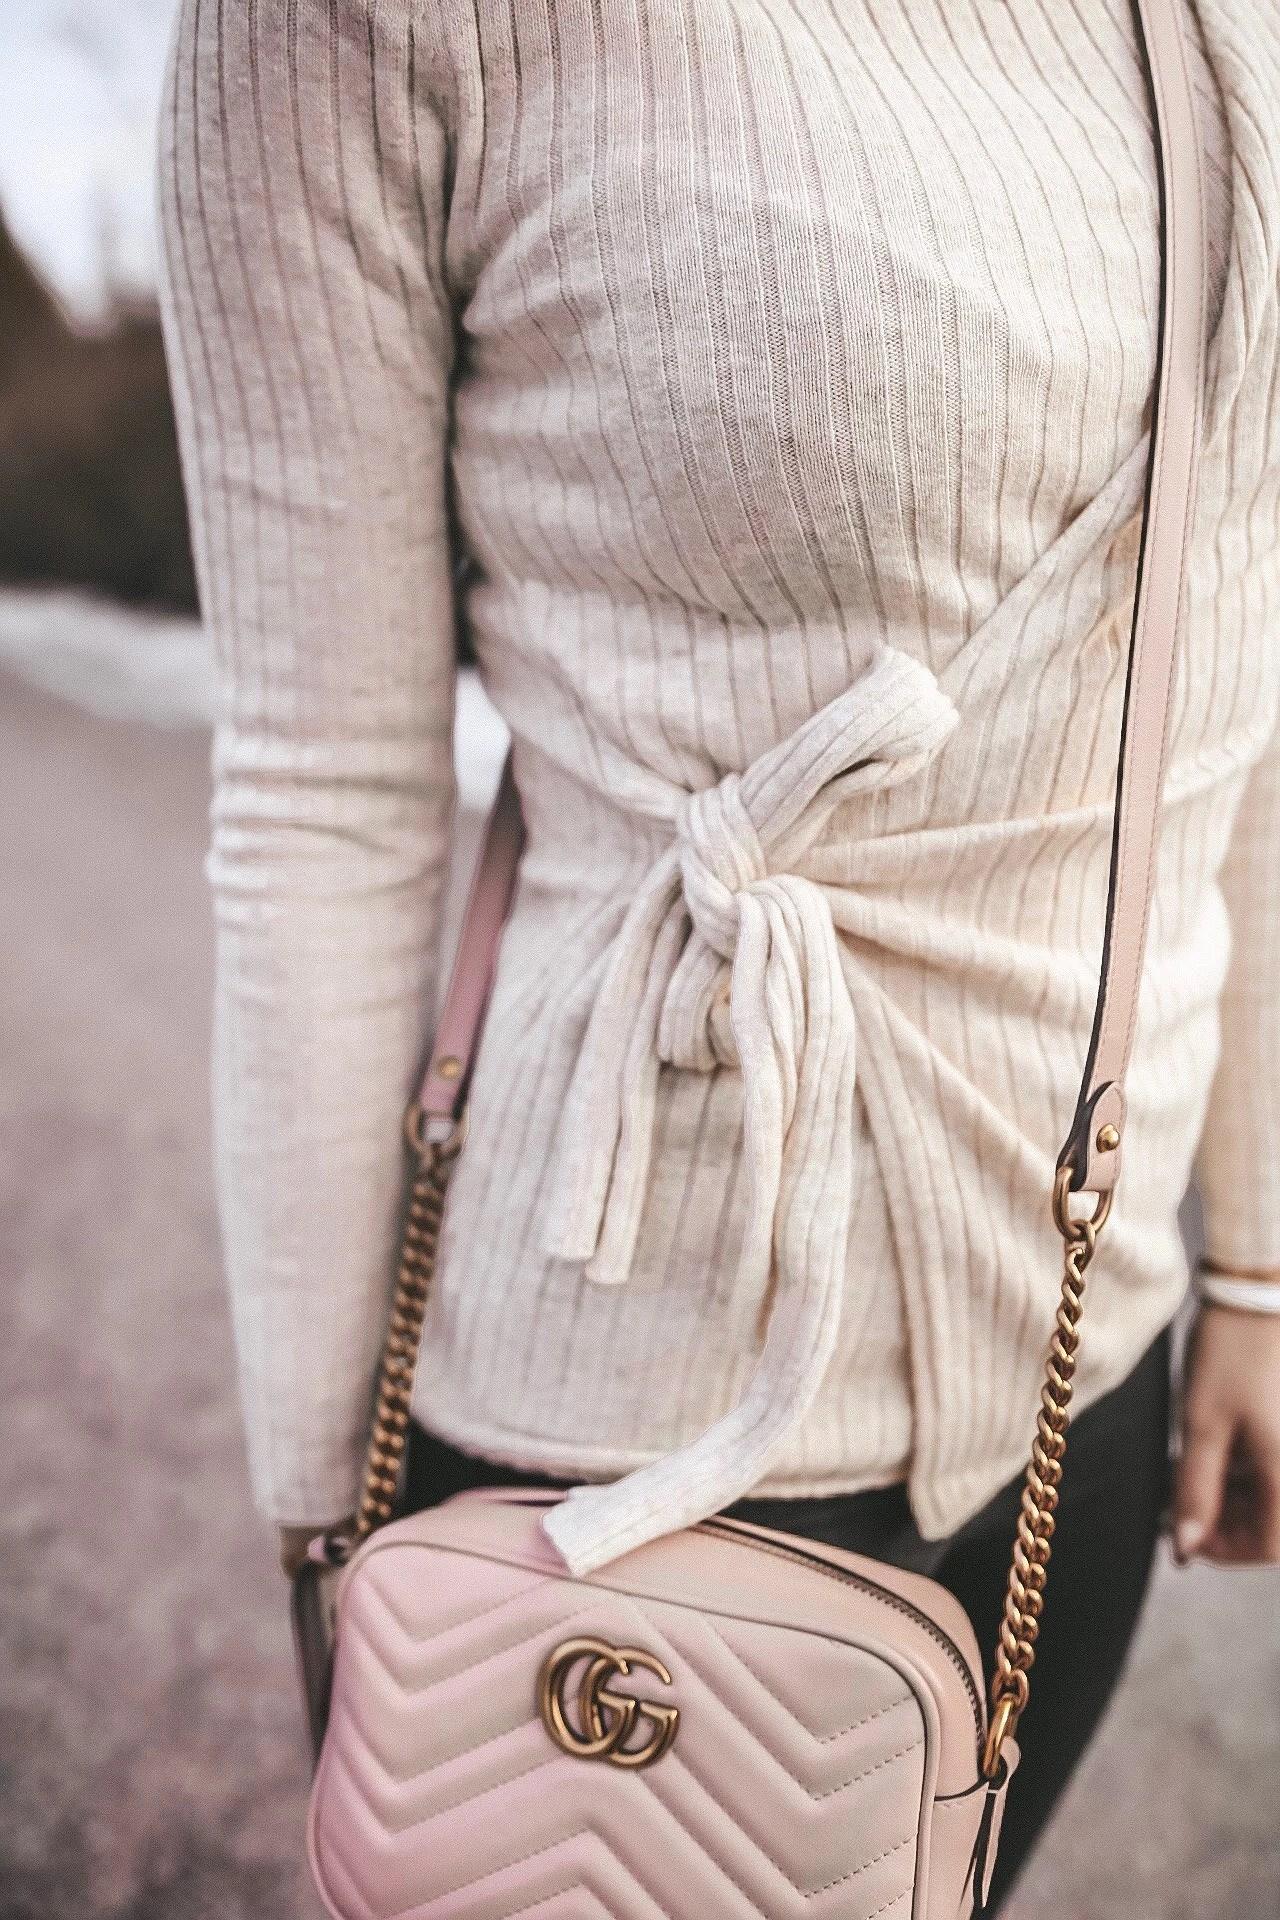 Creamy white knit